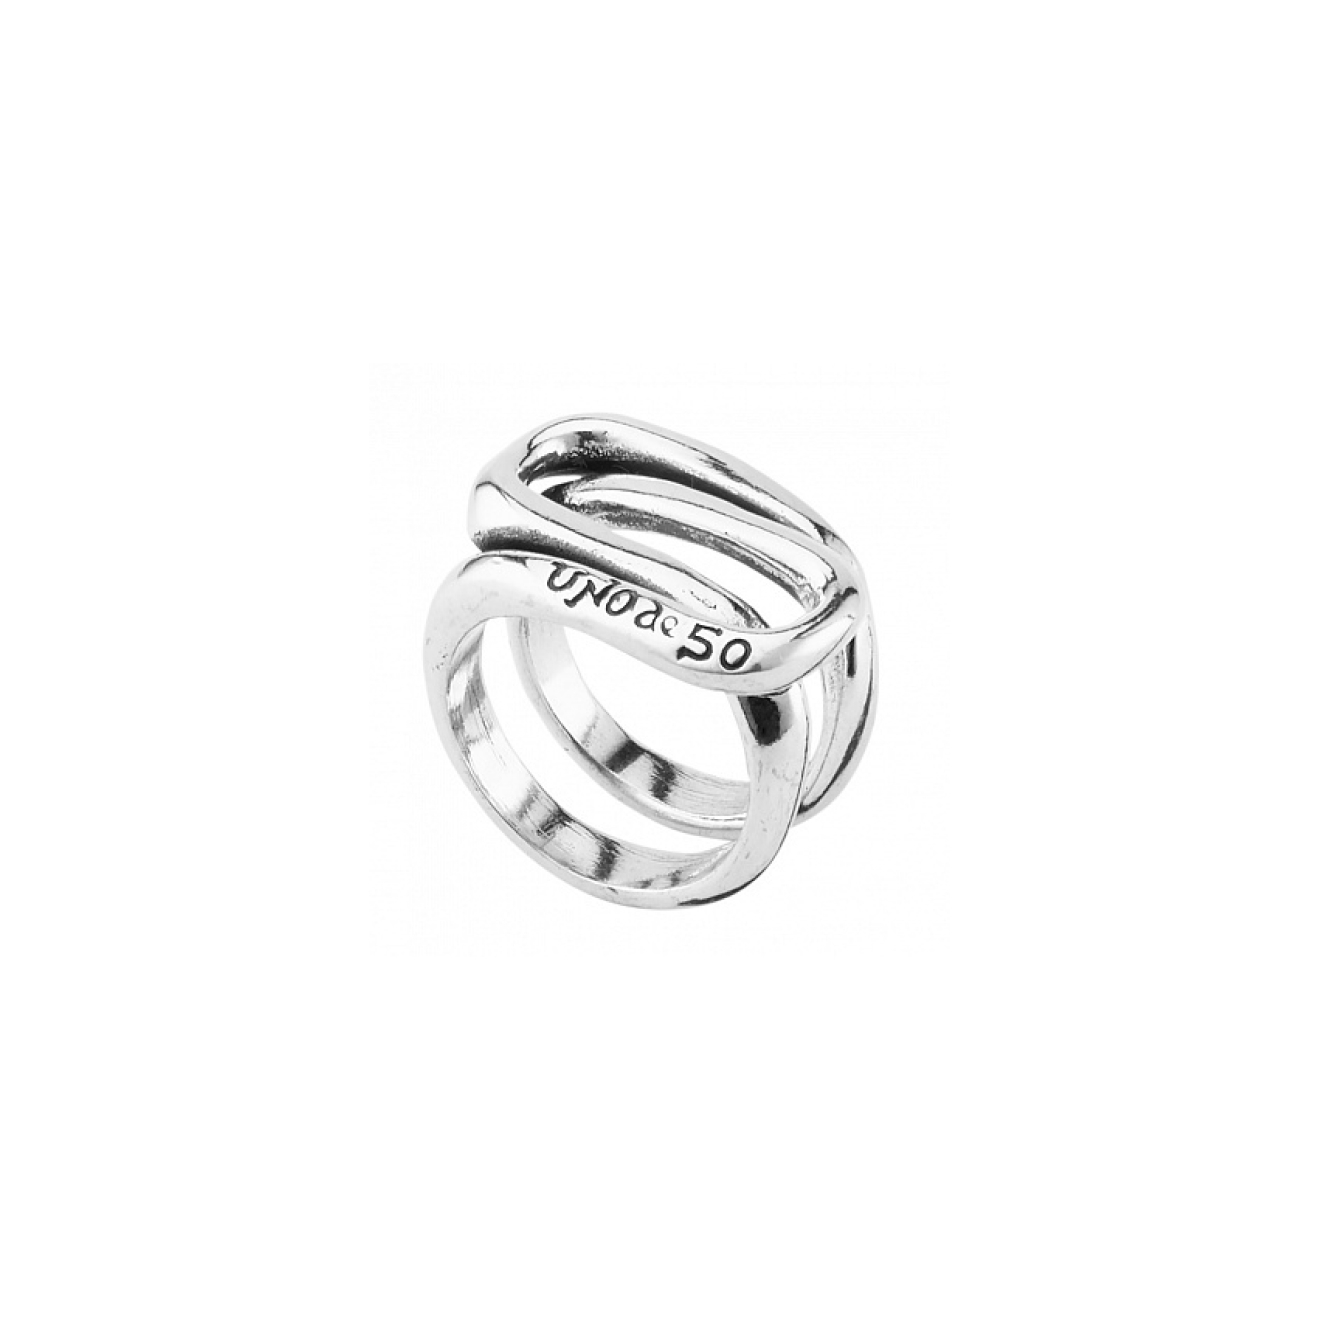 Unode50 Серебристое кольцо Trapped, из коллекции Eternal недорого